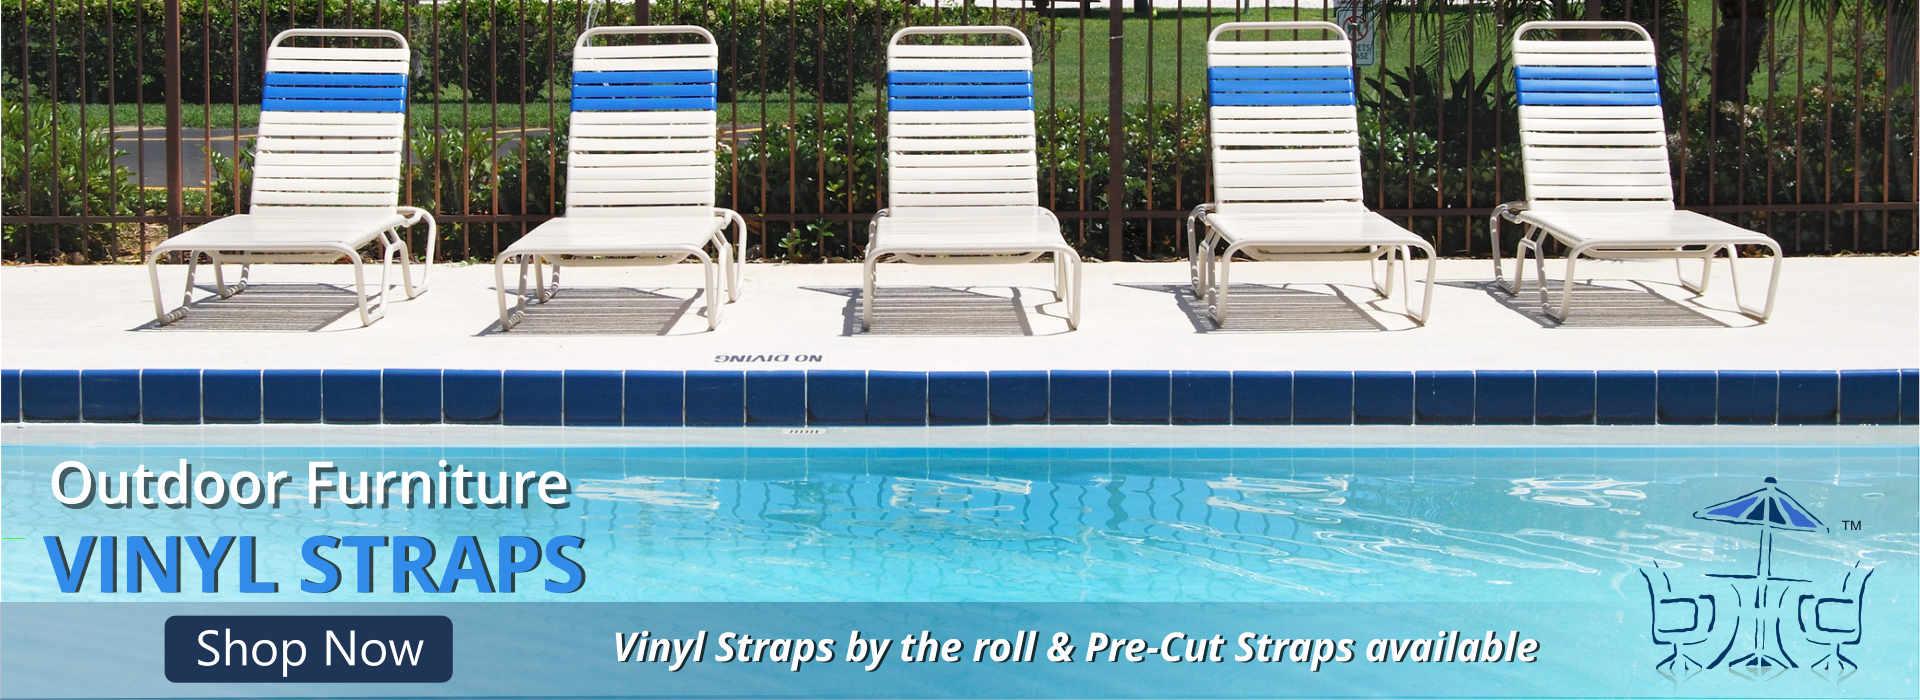 Vinyl Strap Chairs. Umbrella Outdoor Furniture Part 98